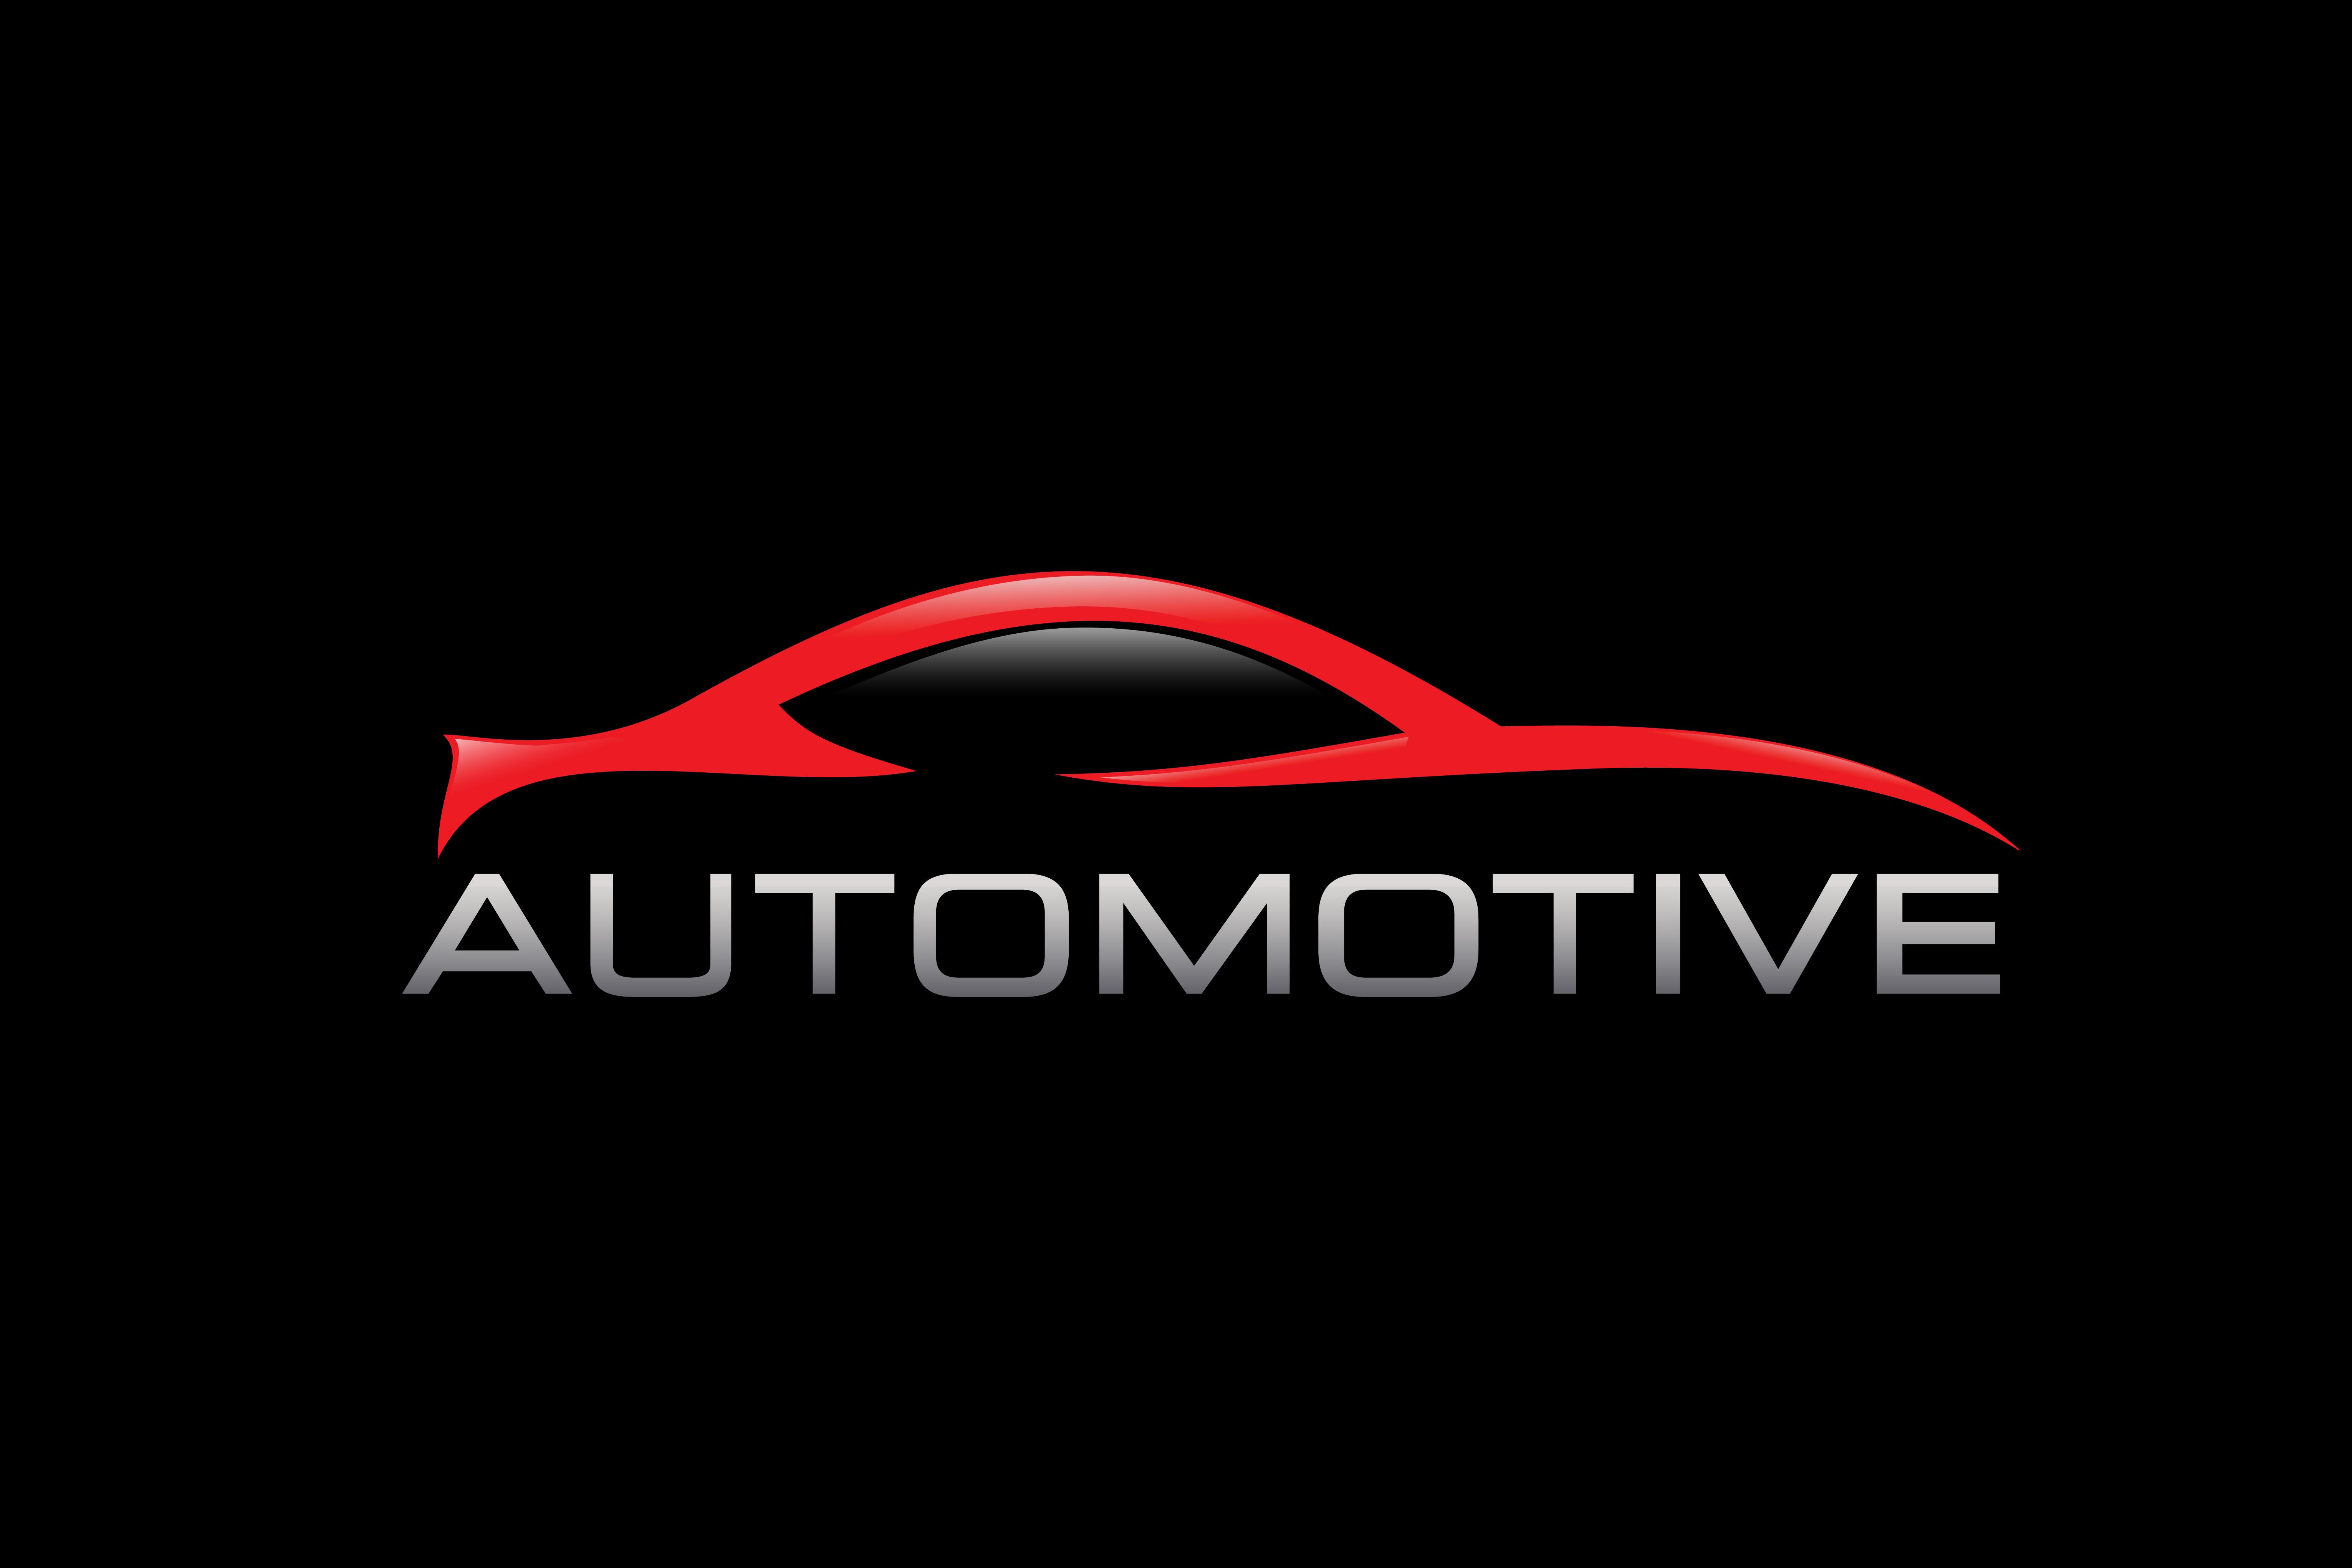 Automotive Logo Design - Download Free Vectors, Clipart ...